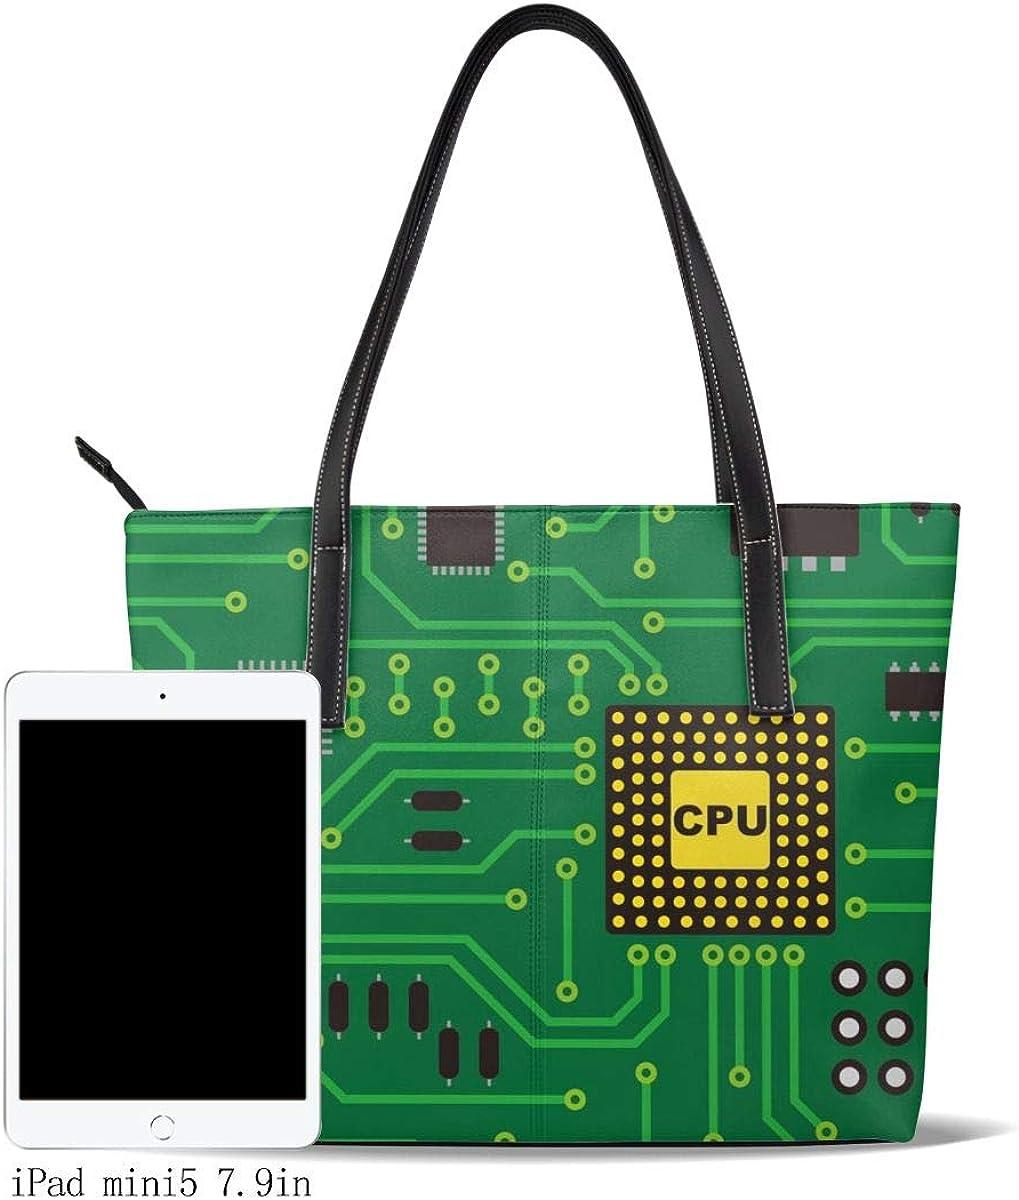 Nerd Circuit Board Cpu Handbags For Women Fashion Ladies PU Leather Top Handle Satchel Shoulder Tote Bags-Large Capacity